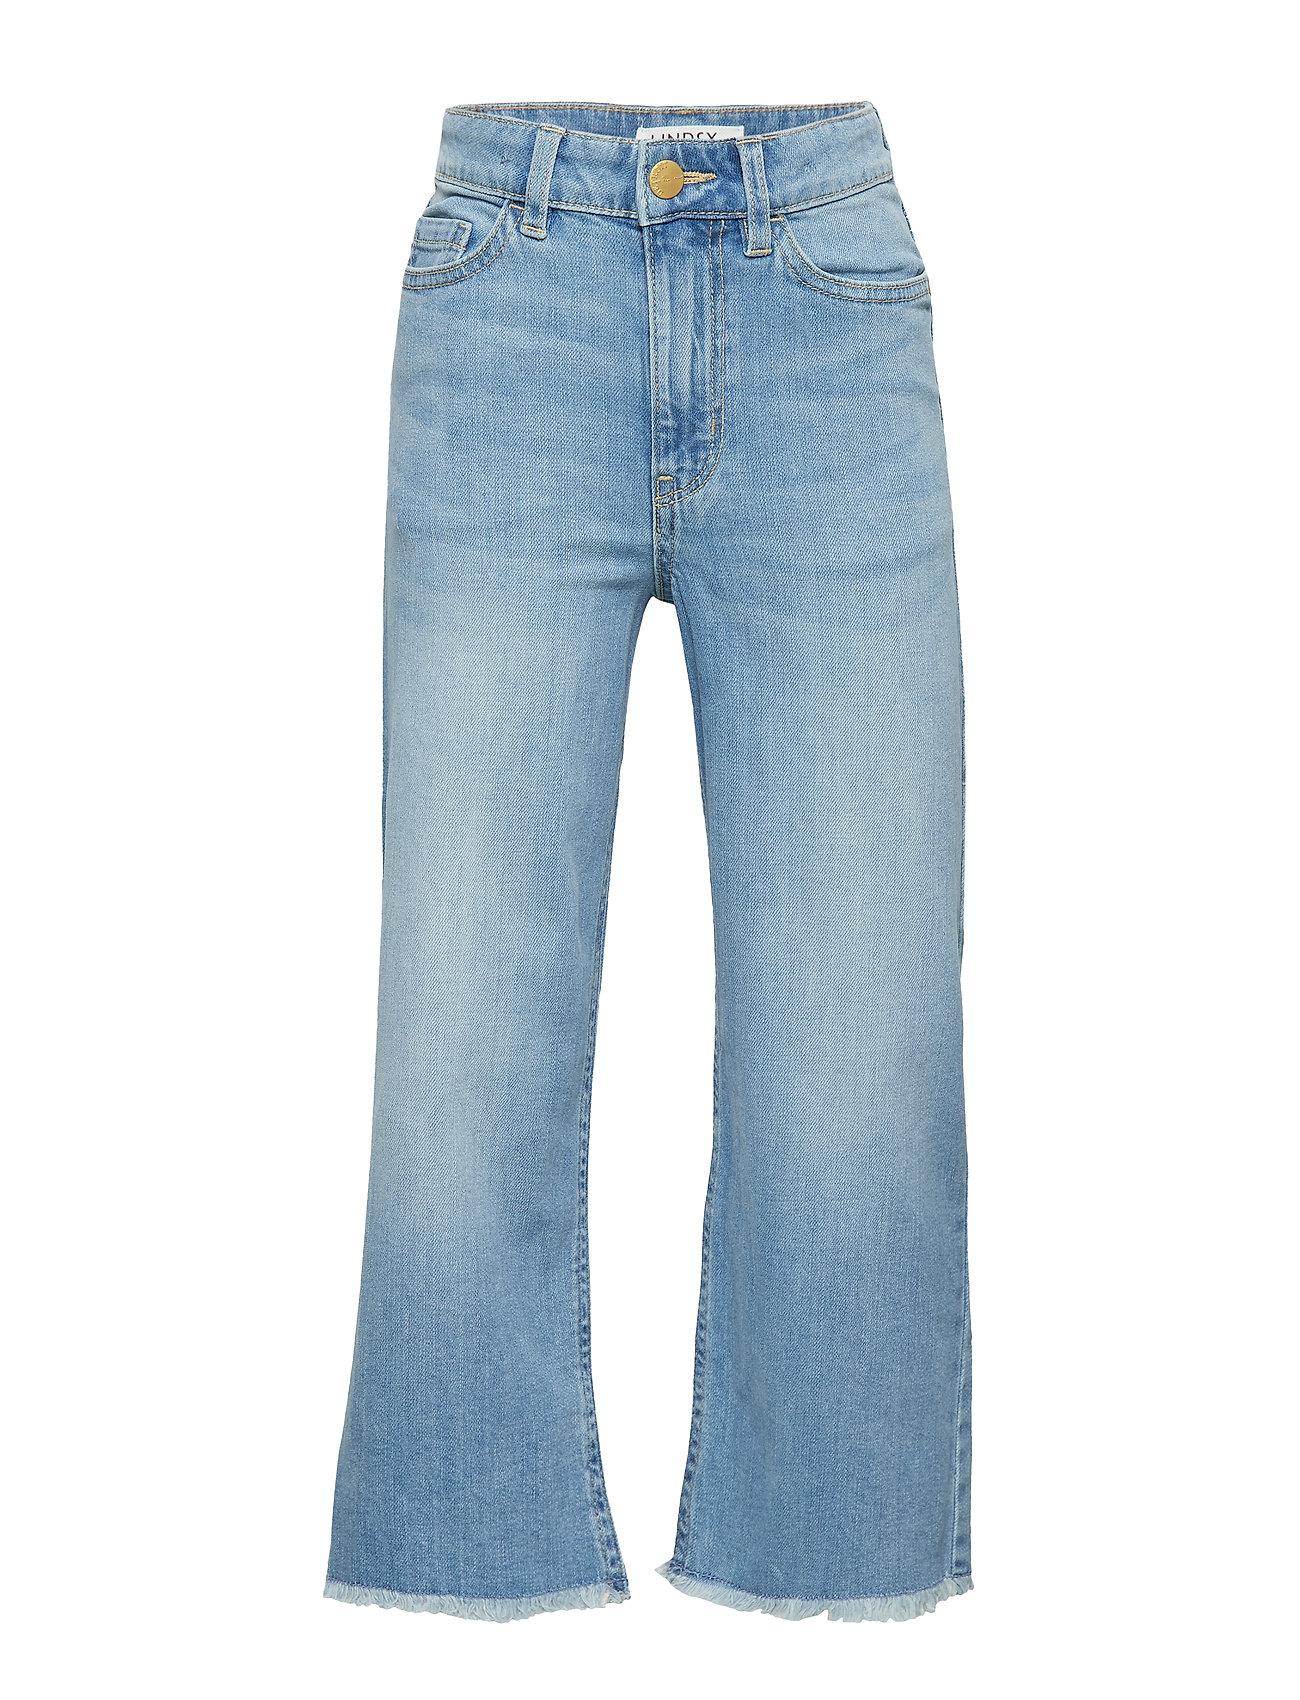 Lindex Light blue narrow wide cropped jeans - MEDIUM DENIM